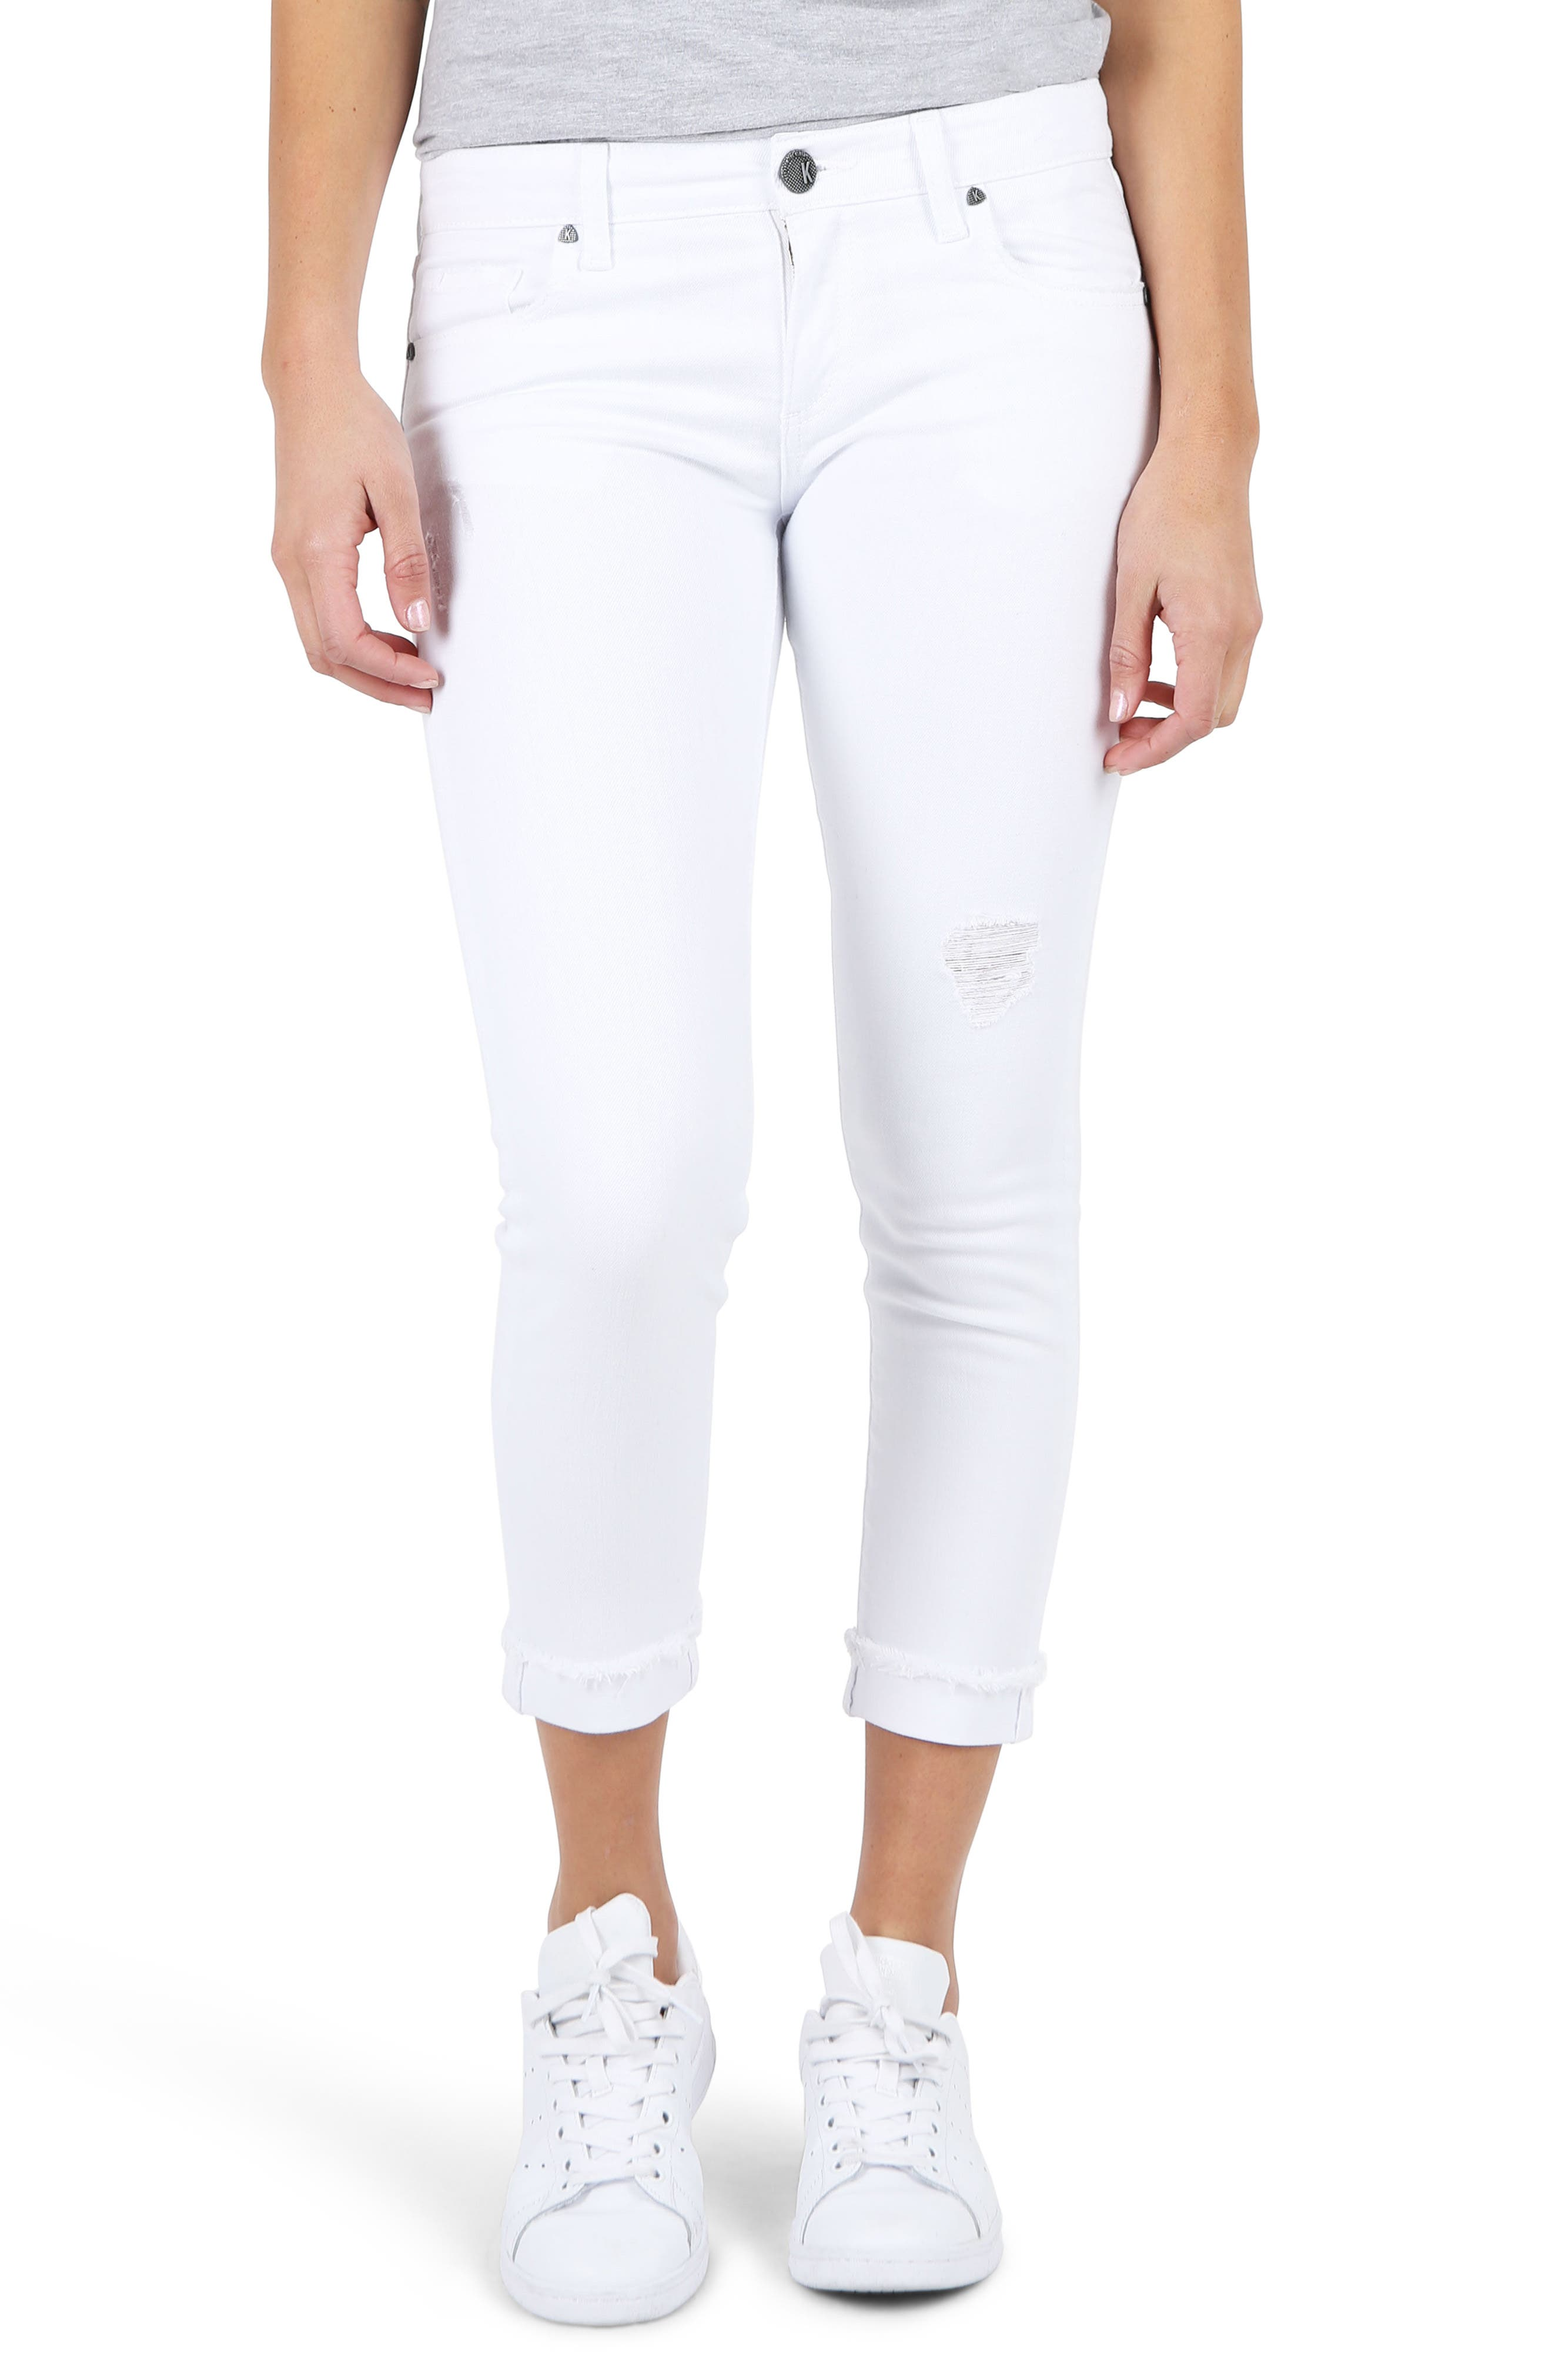 KUT Kollection Amy Crop White Jeans